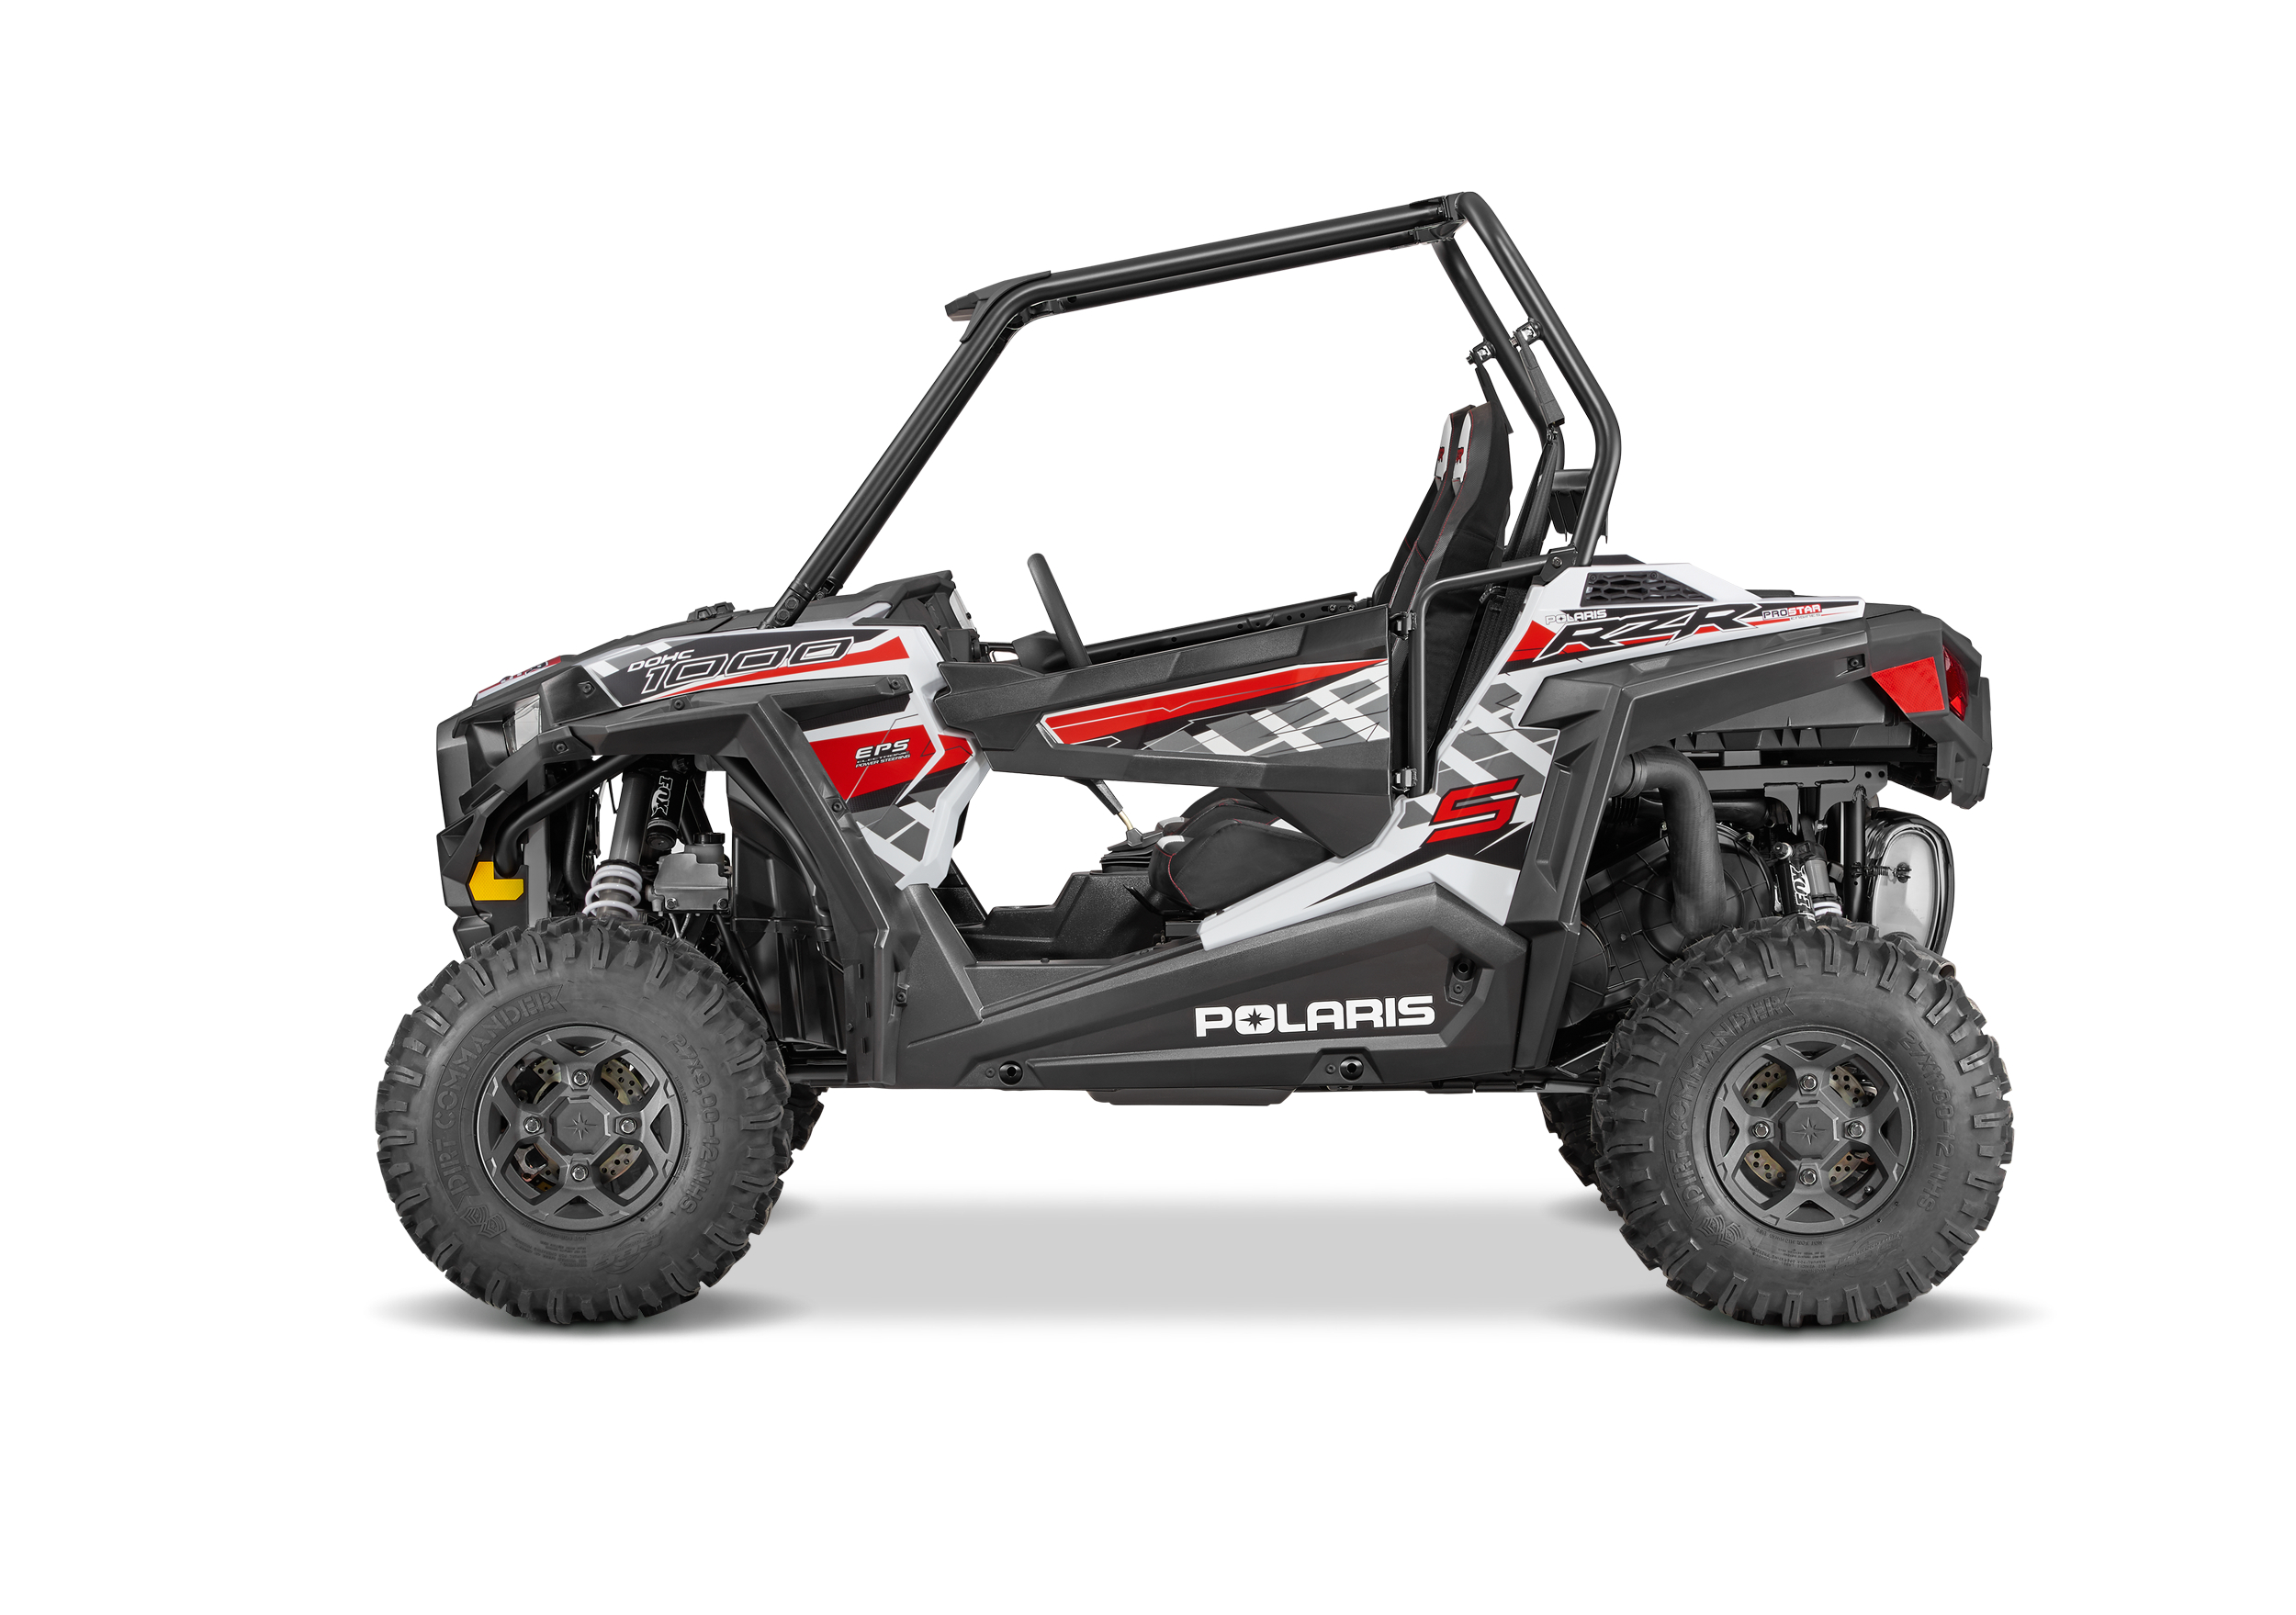 2015 Polaris Rzr >> ALL-NEW POLARIS XP TURBO, RZR S 1000, ACE 900 AND MORE! | Dirt Wheels Magazine